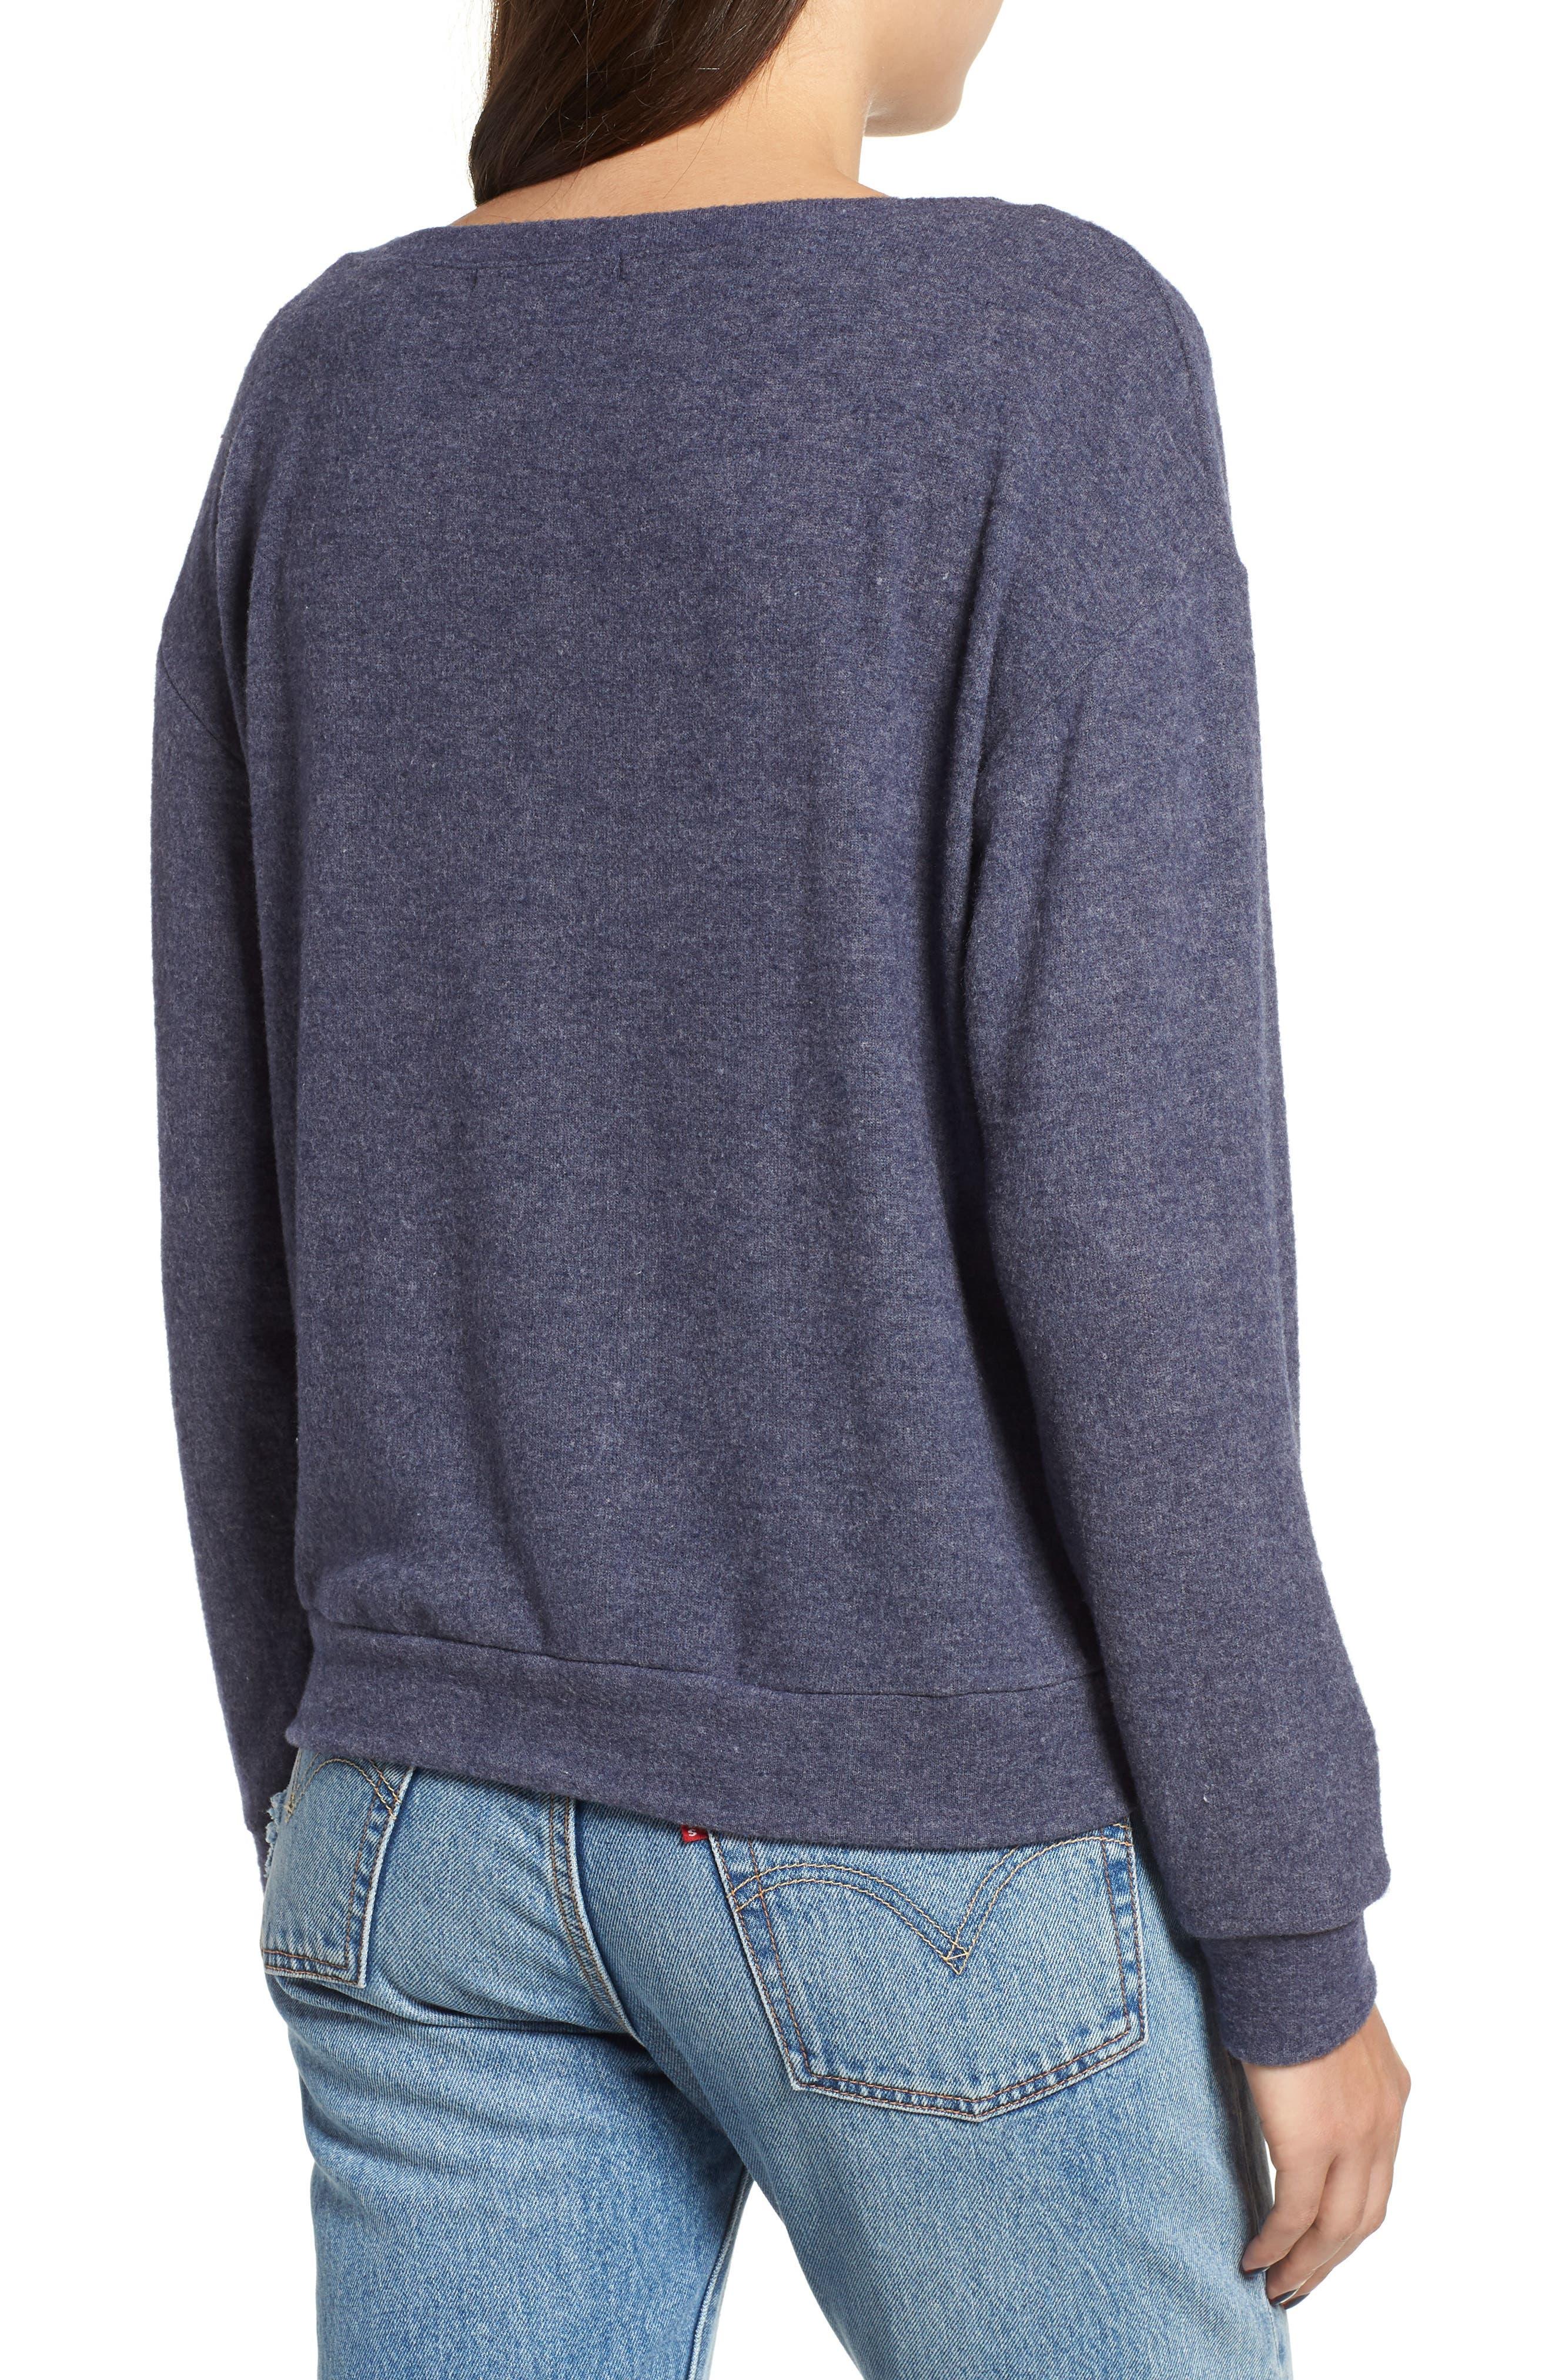 Keys Sweatshirt,                             Alternate thumbnail 2, color,                             HEATHER NAVY